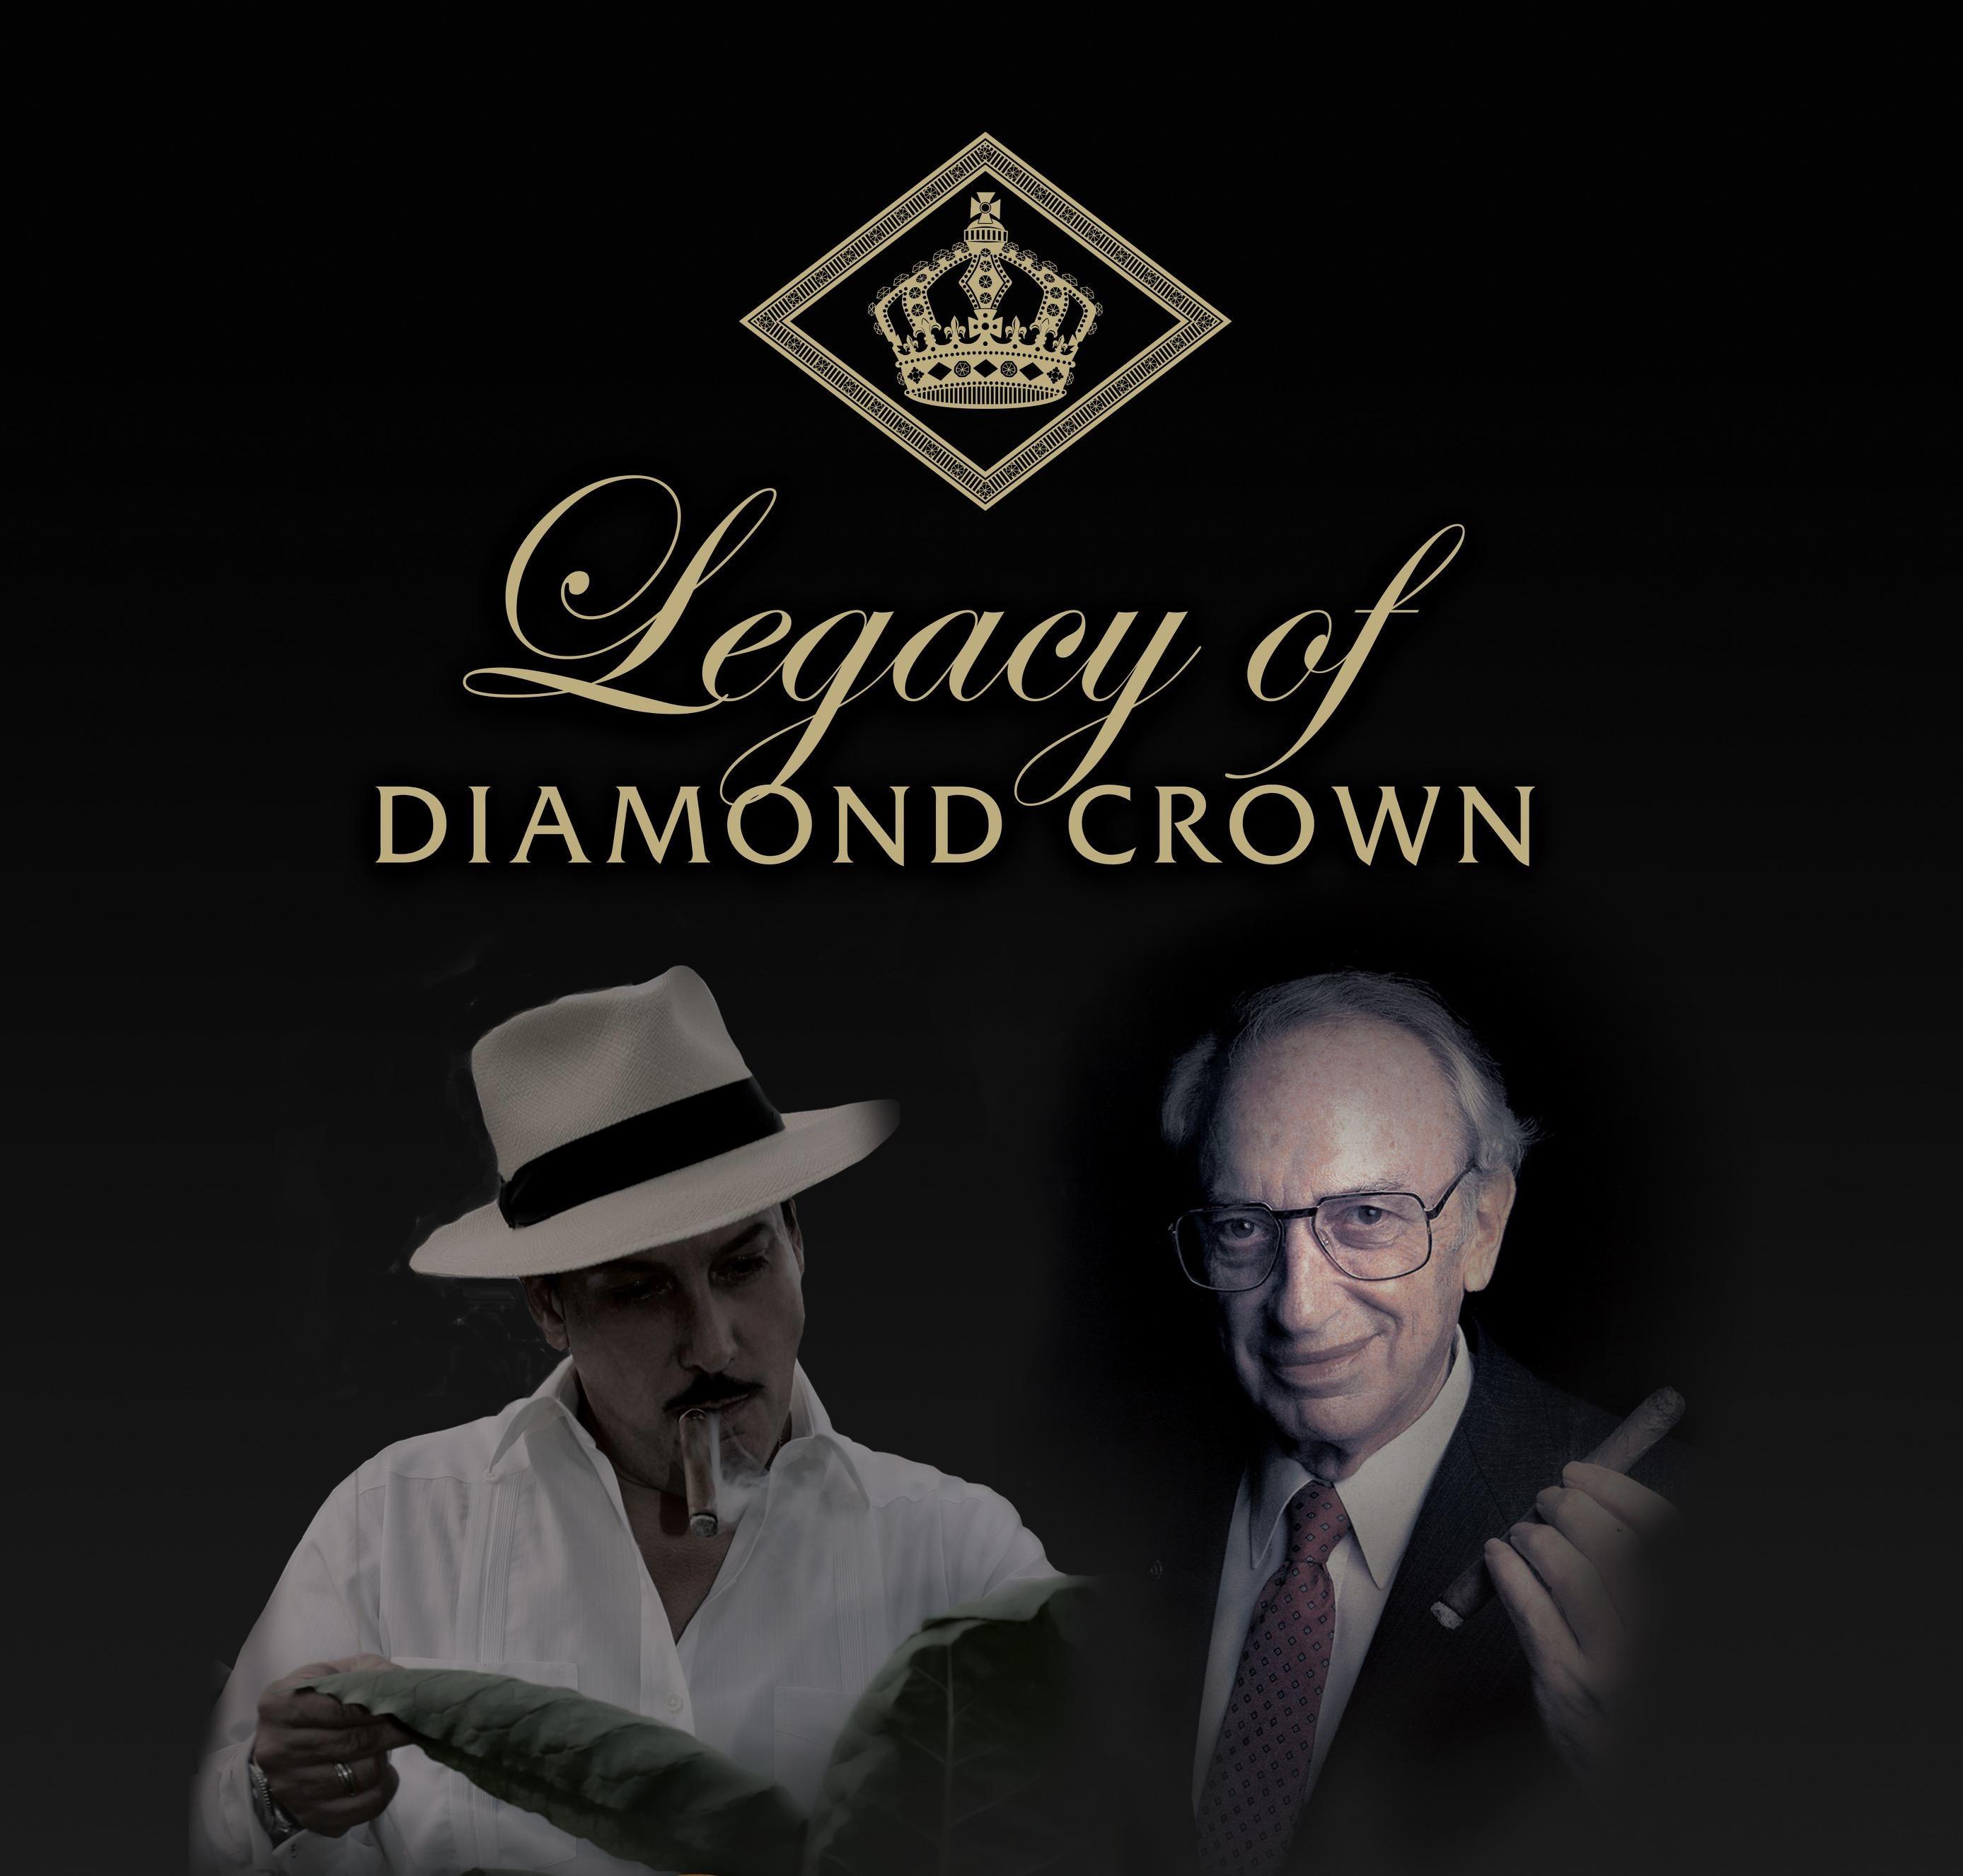 Legacy of Diamond Crown